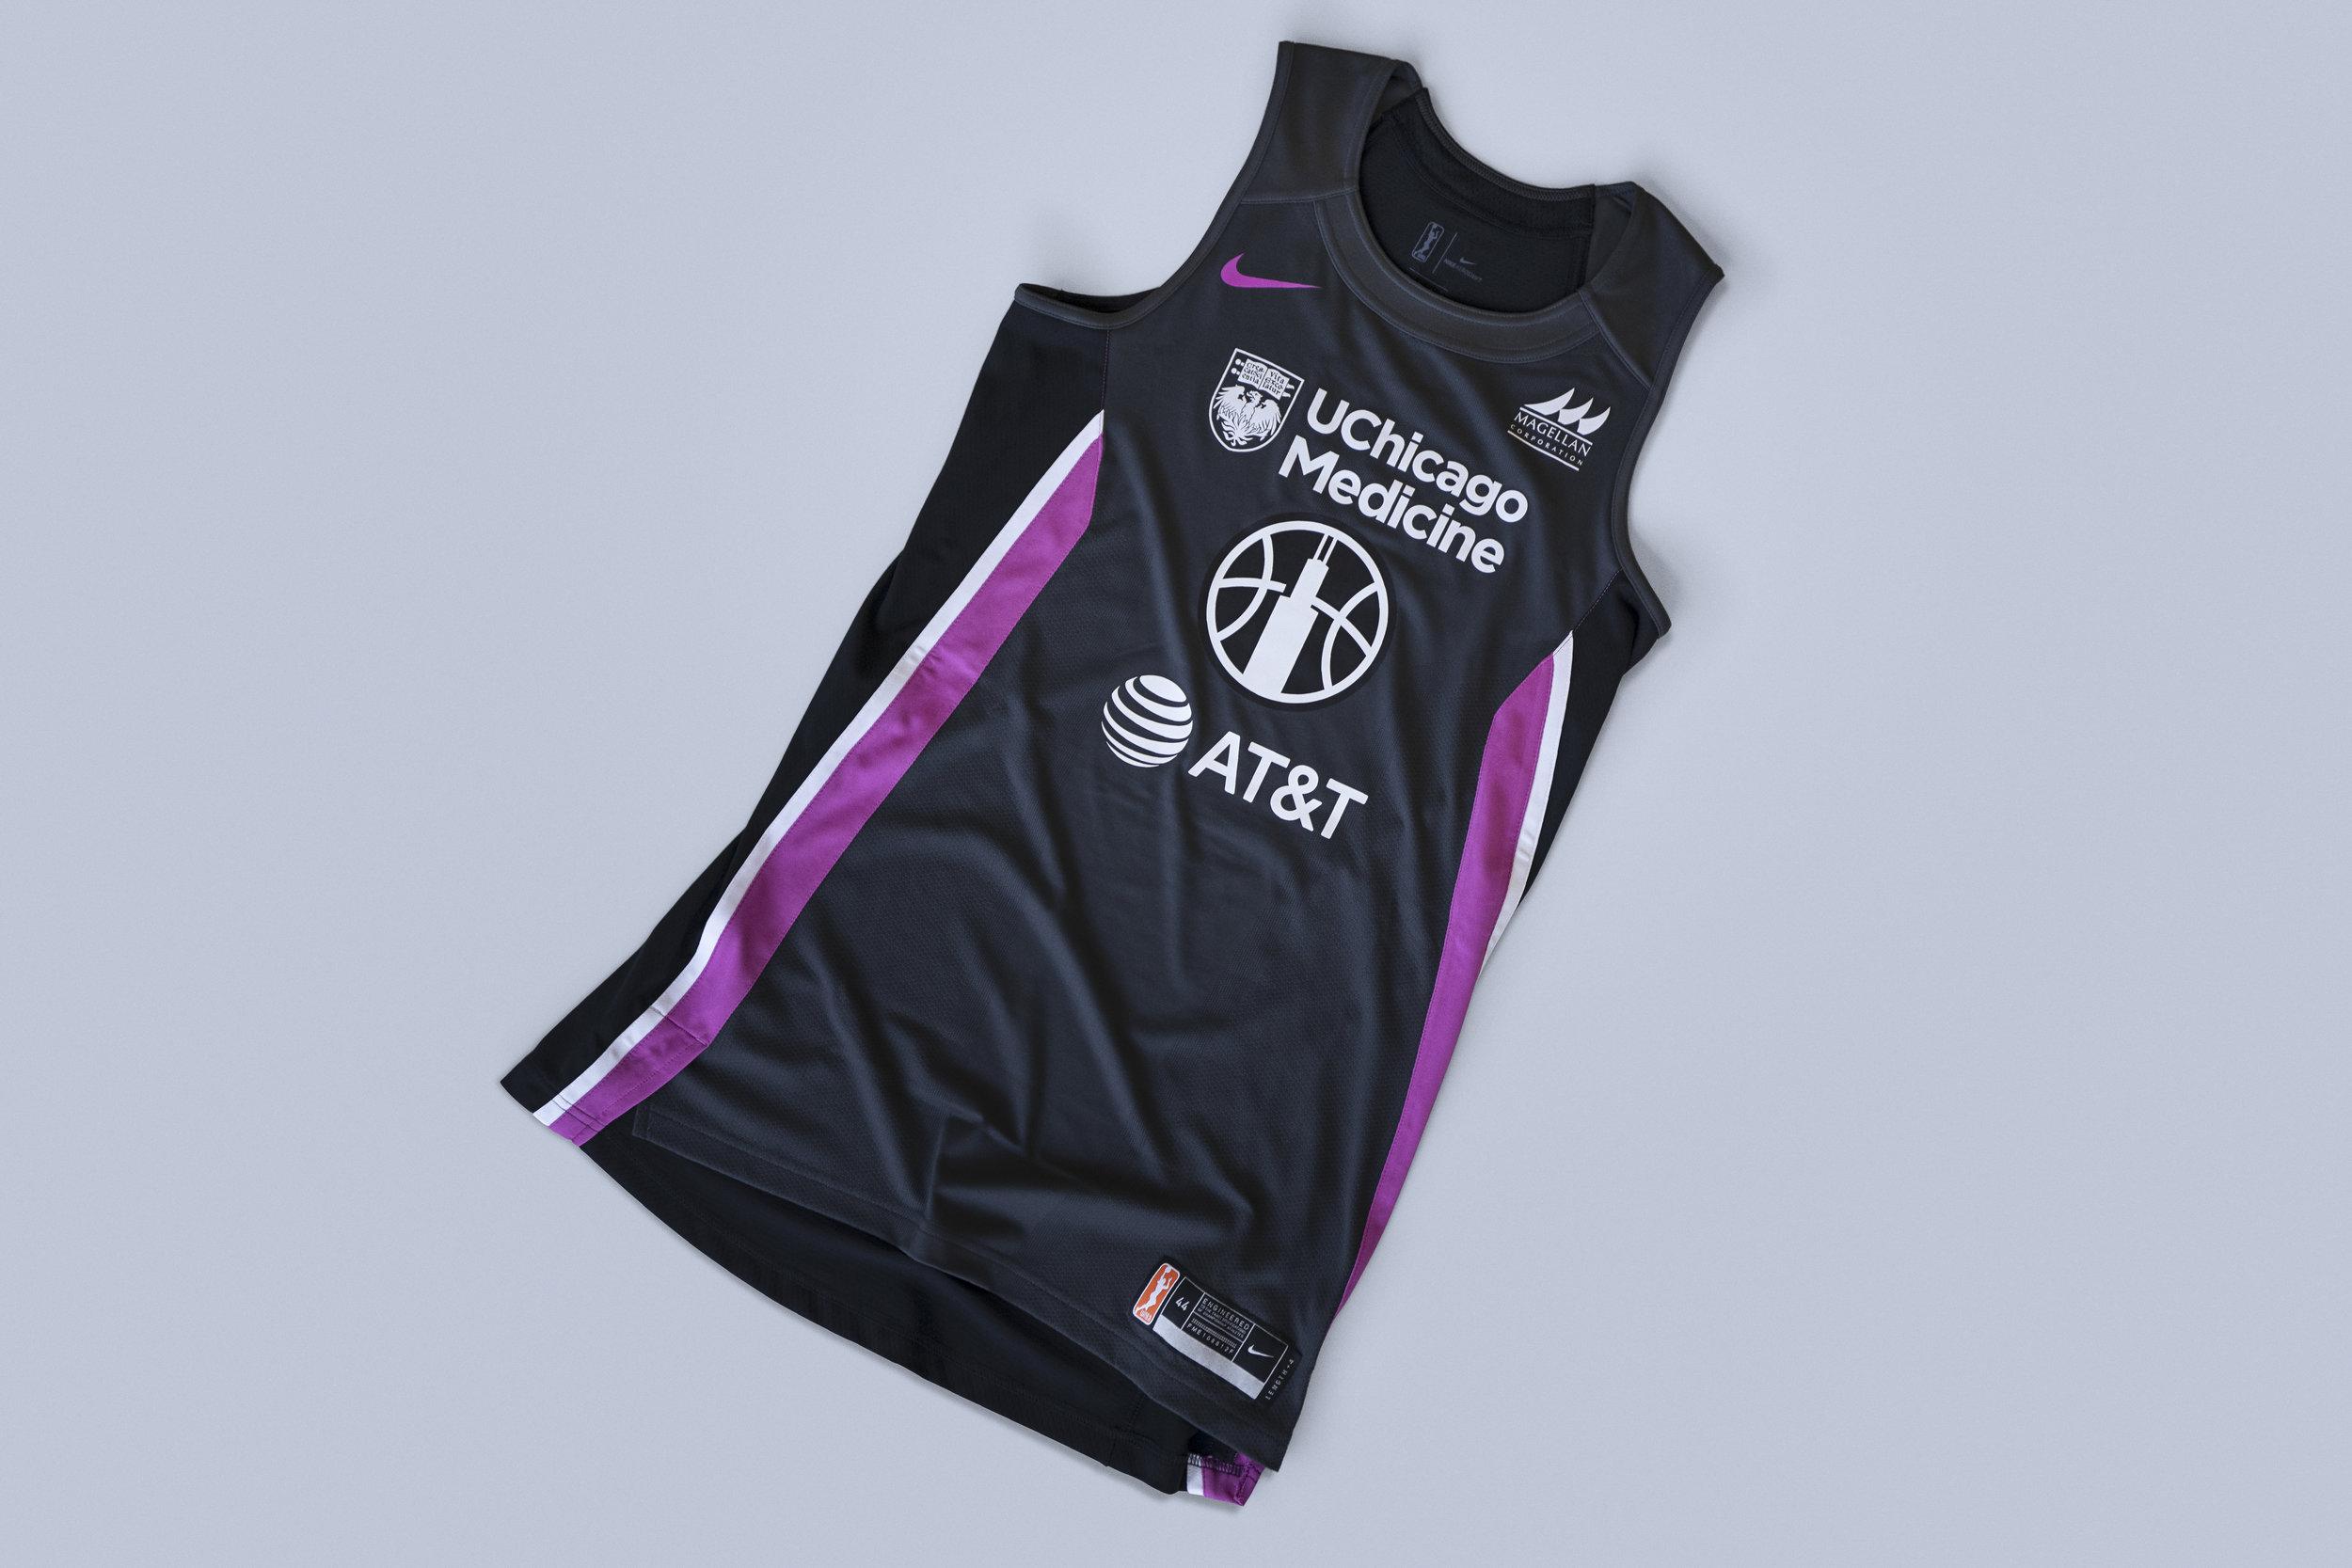 Nike_WNBA_Uniforms2019_BHA_ChicagoSky_IMG_9020_86889.jpg